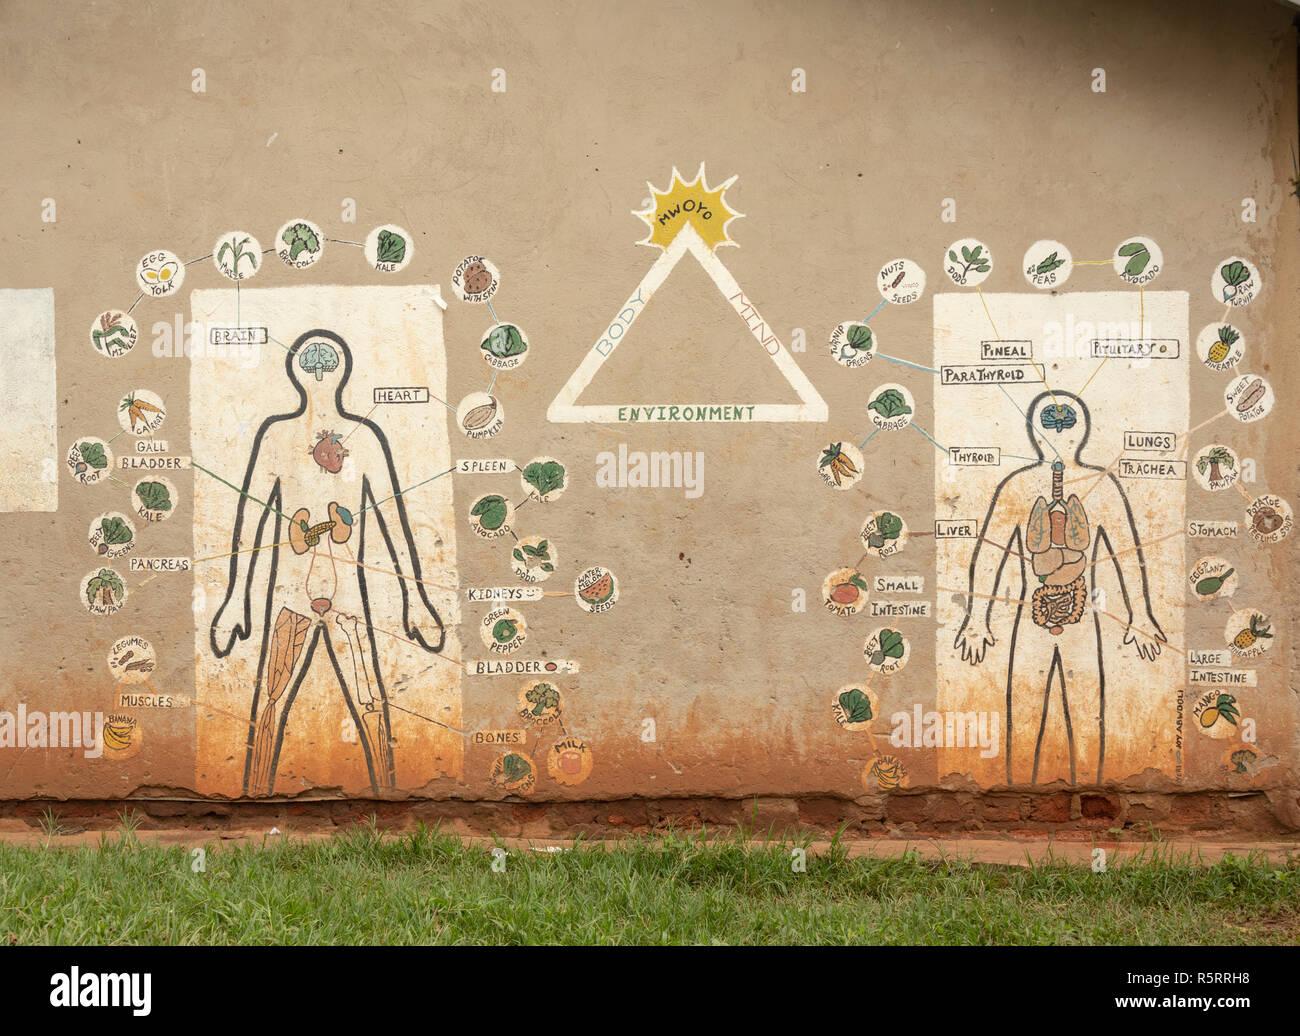 sign for body parts in primary school, Bigodi, western Uganda, Africa - Stock Image